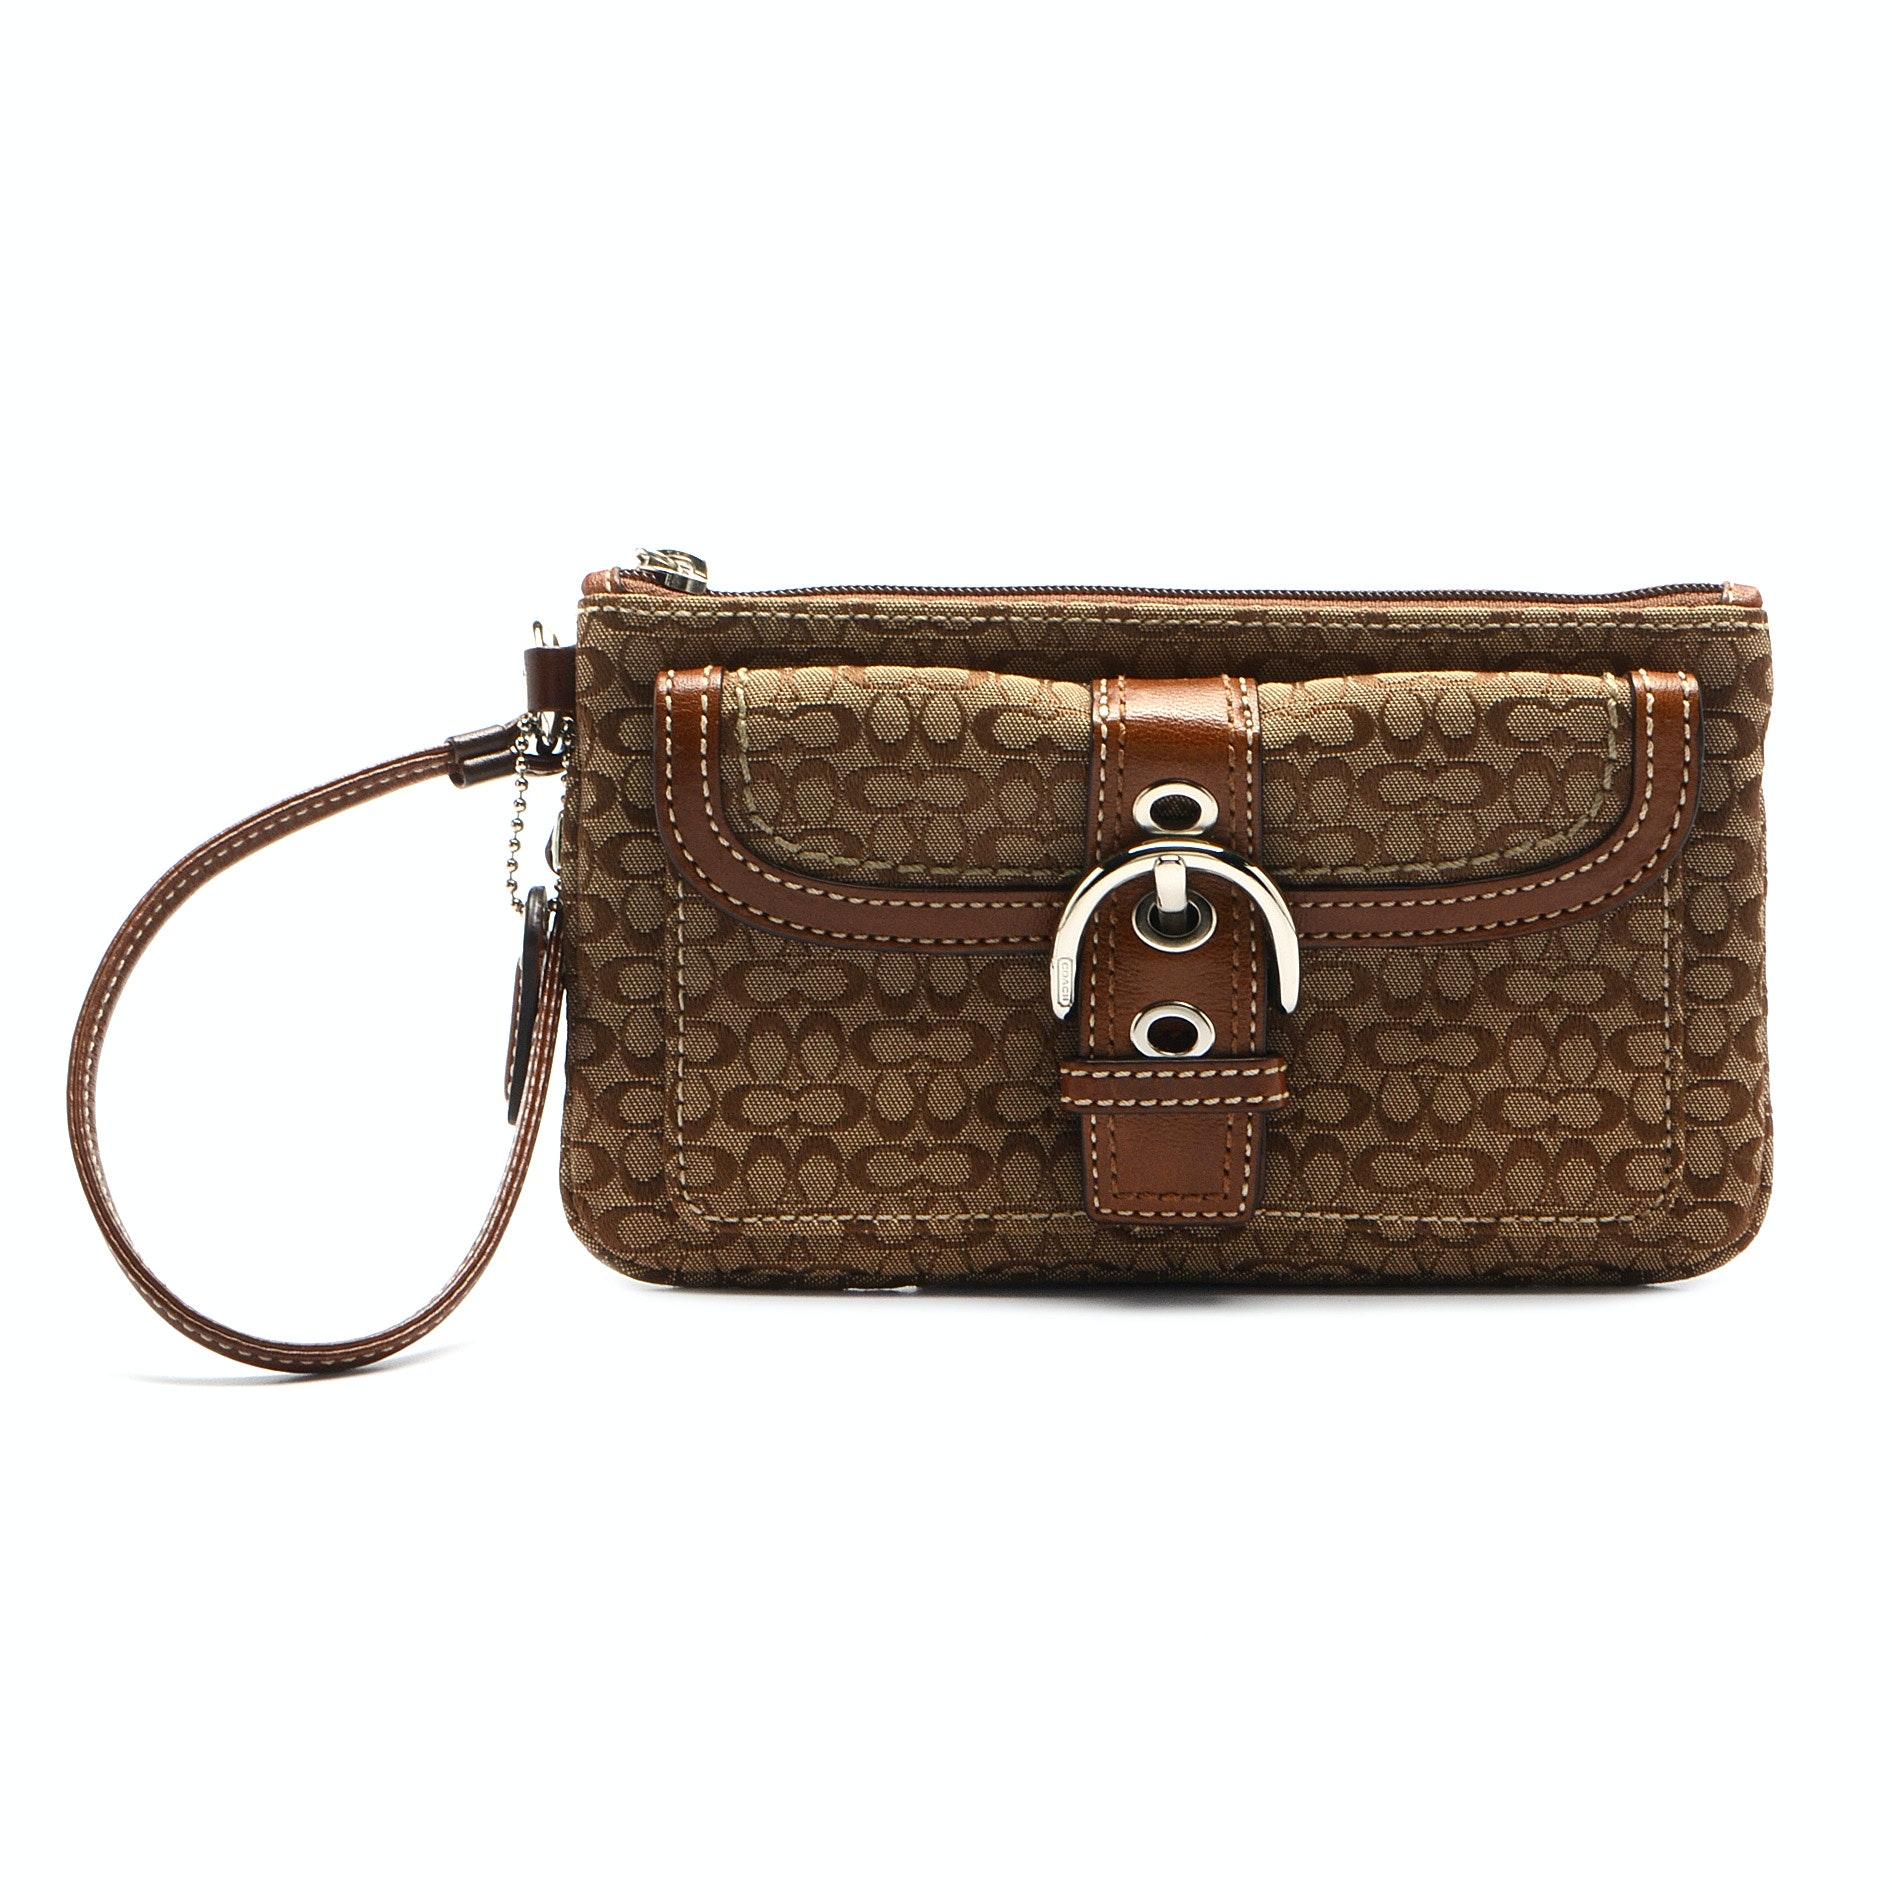 Coach Signature C Wristlet Handbag